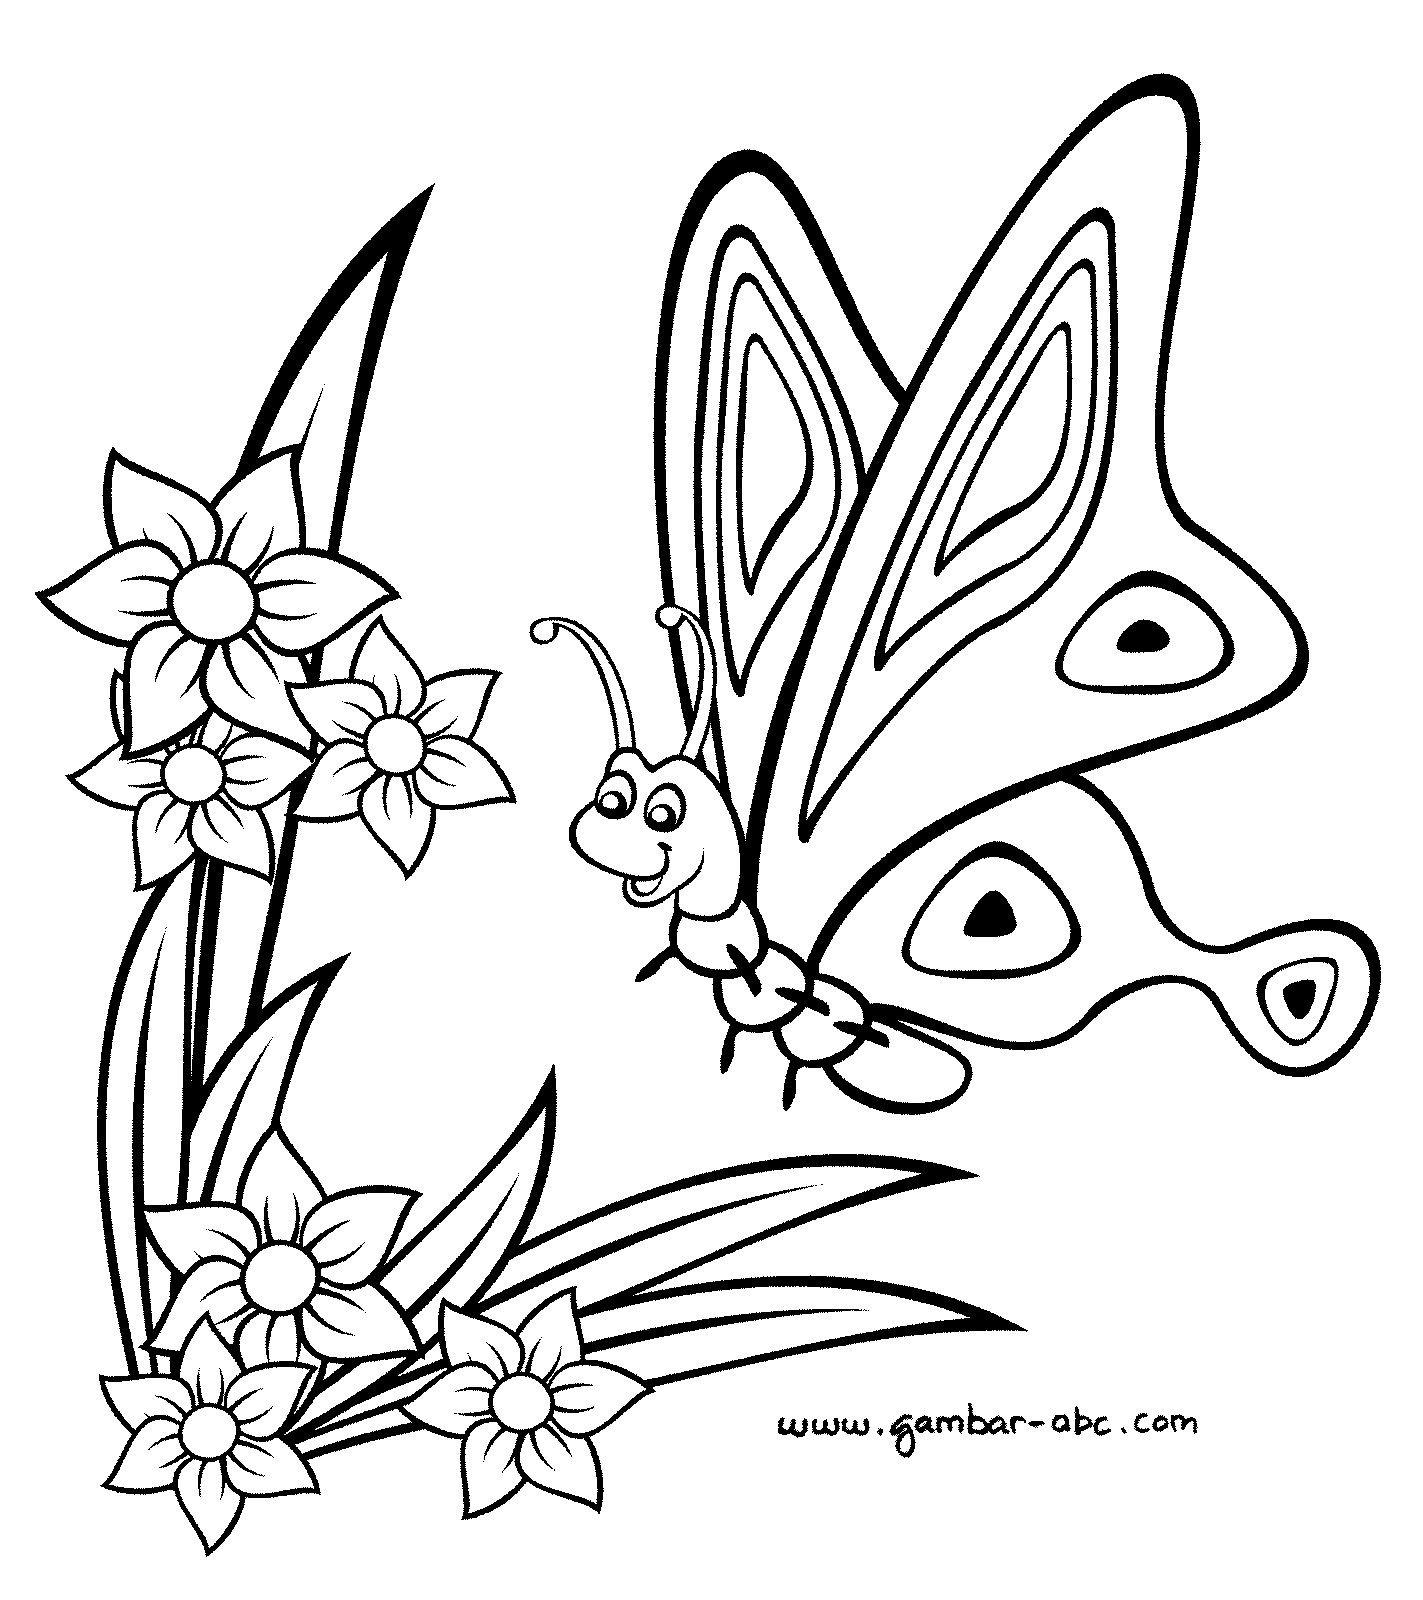 Sketsa Gambar Bunga Hitam Putih Mewarnai Kupu Kupu Contoh Gambar Sketsa Menggambar Kupu Kupu Menggambar Sketsa